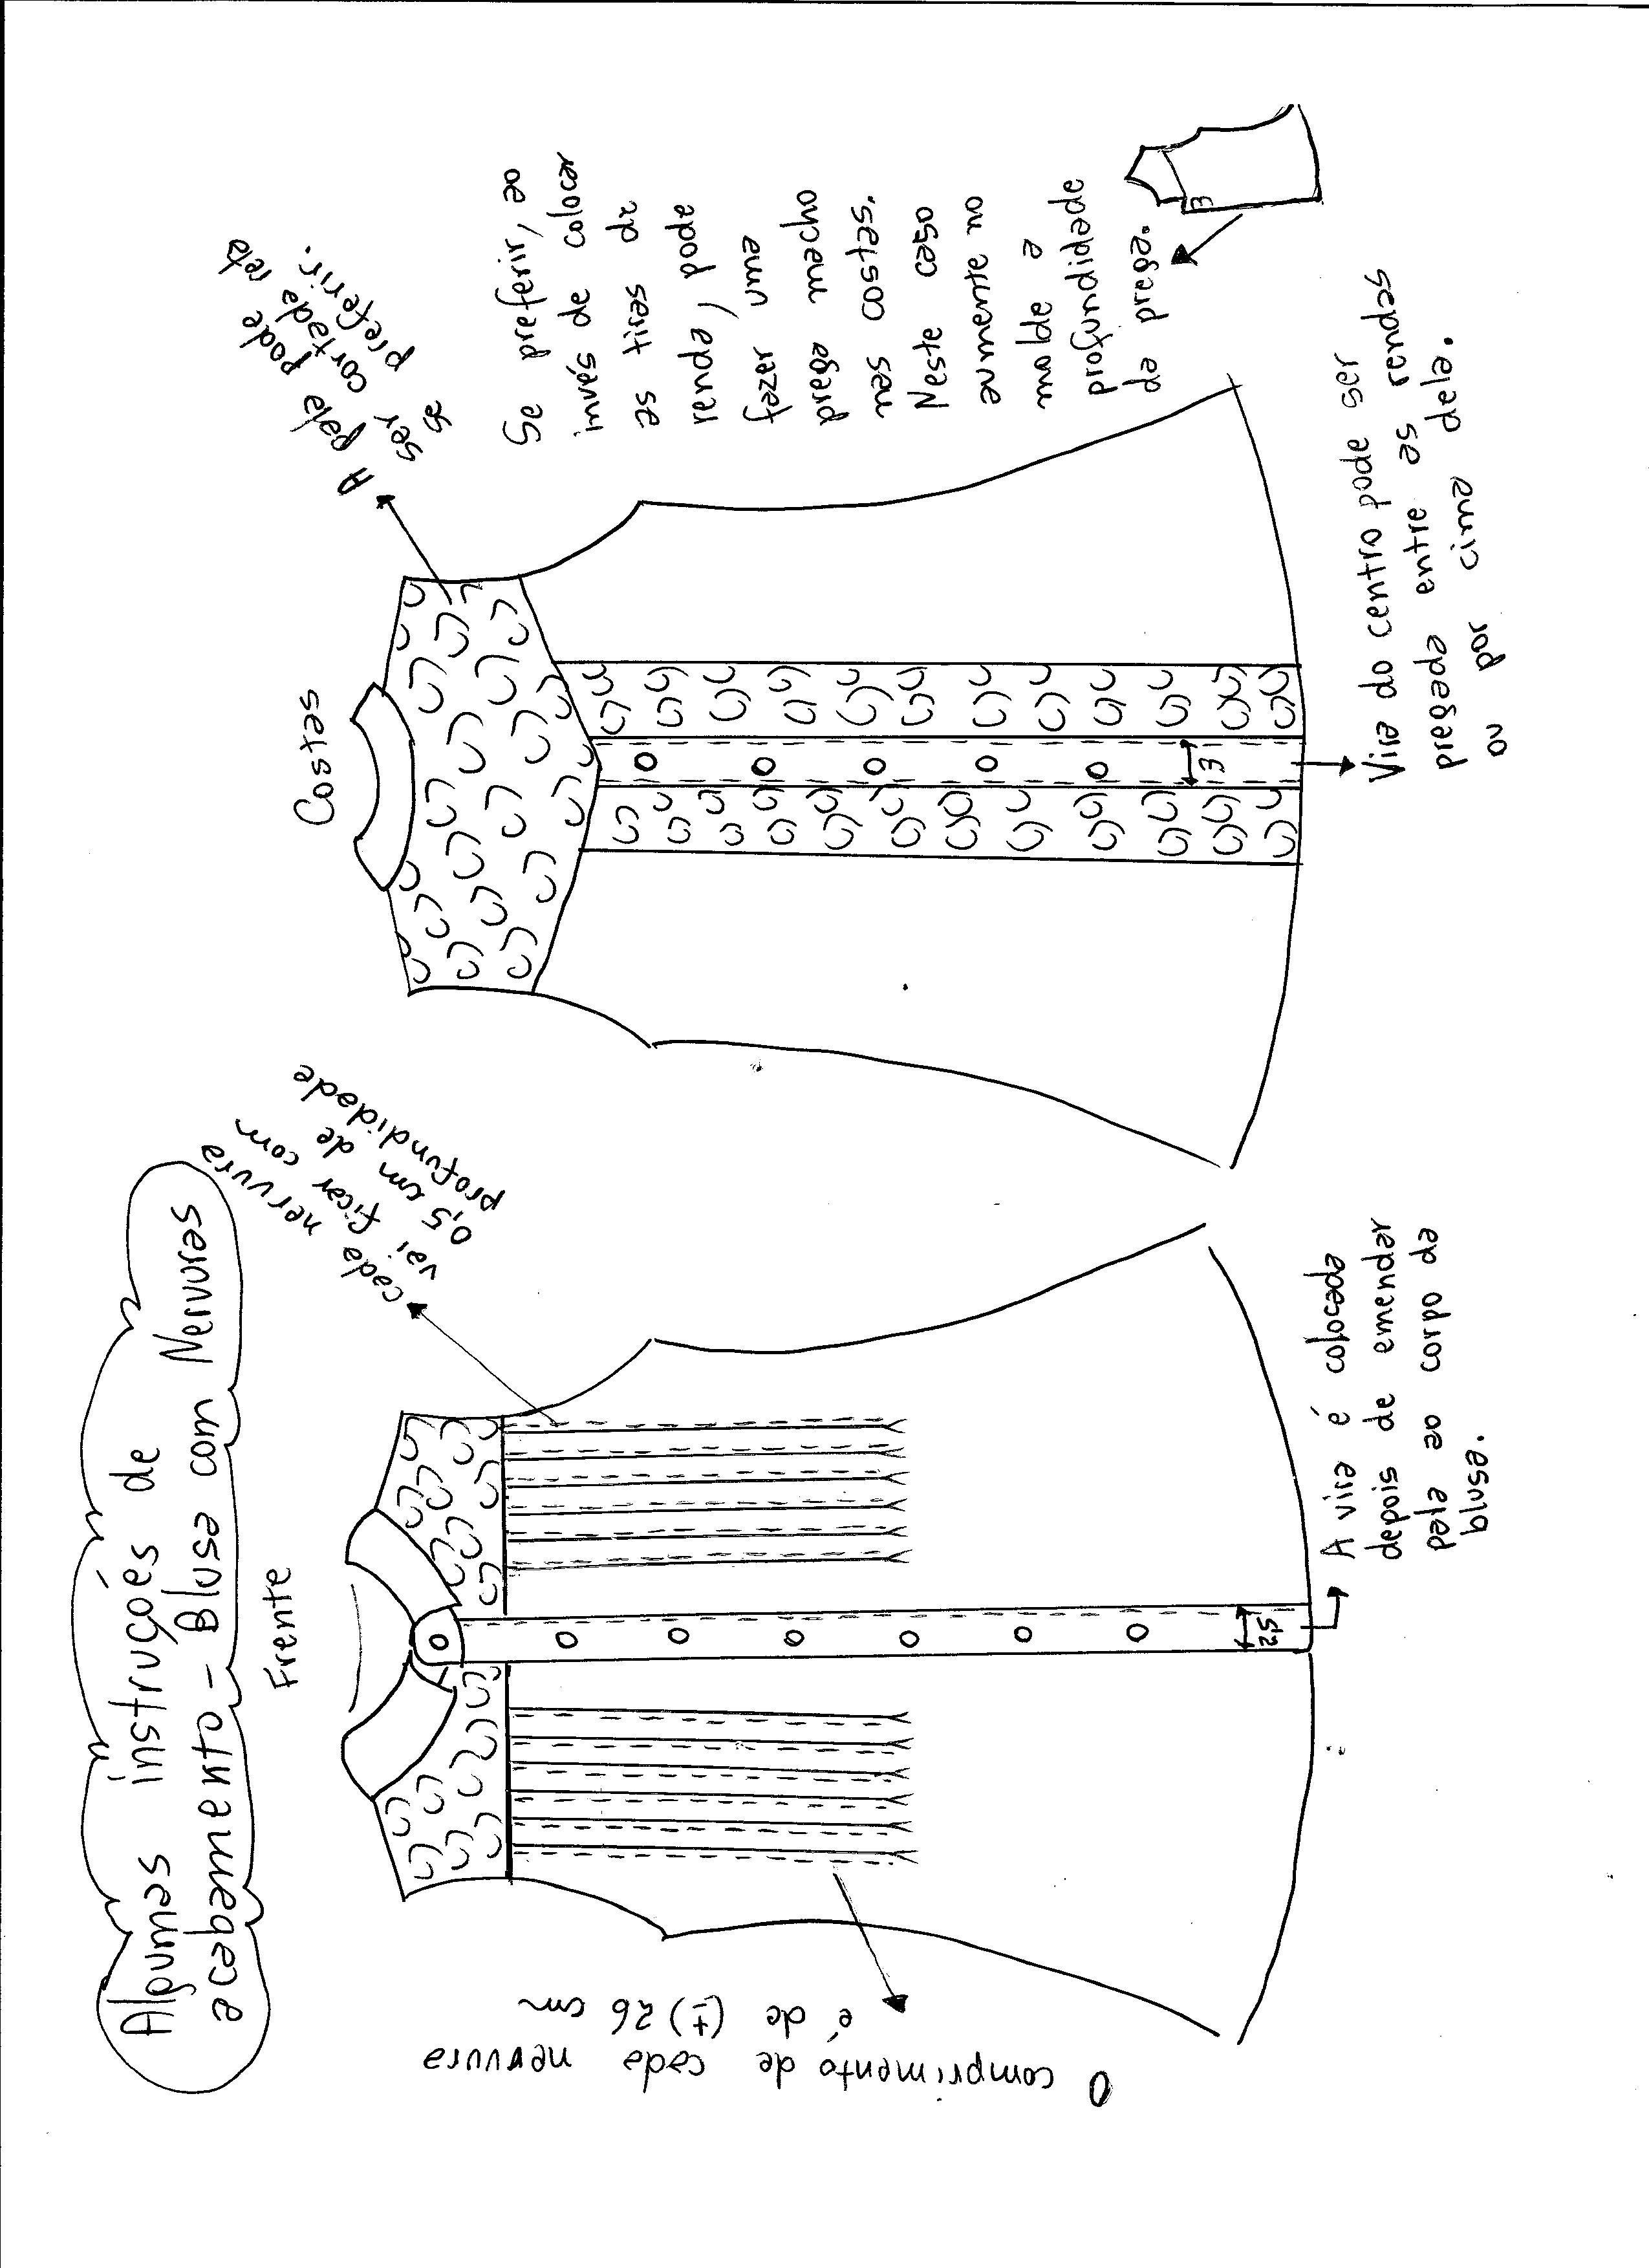 Blusa com nervuras | PATRONES COSTURA | Pinterest | Costura, Molde y ...